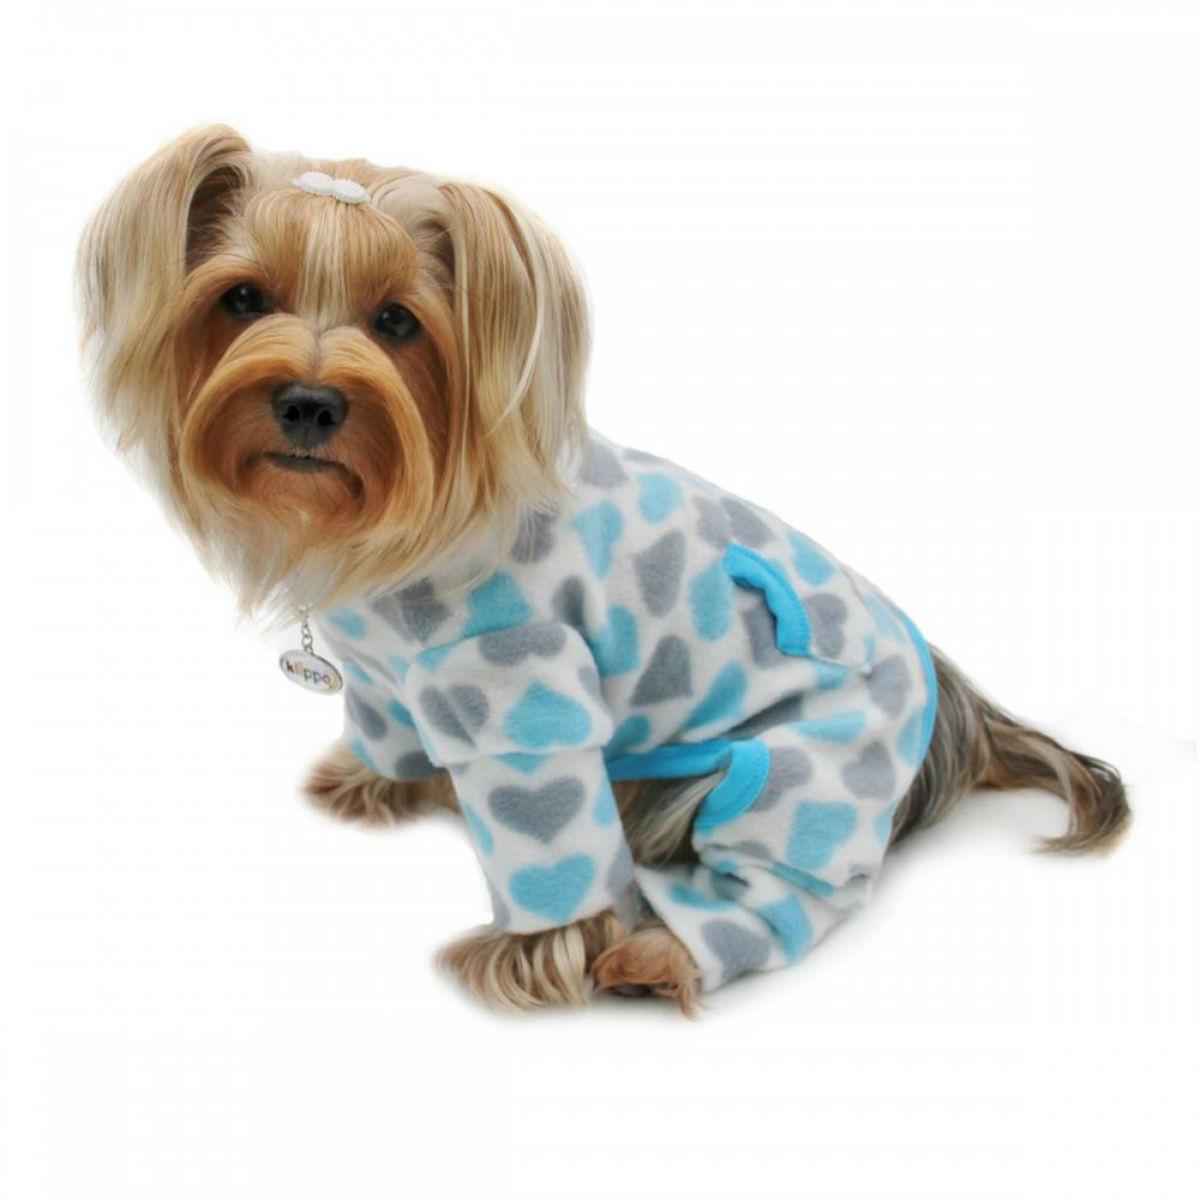 Hearts Turtleneck Fleece Dog Pajamas by Klippo - Blue and Gray